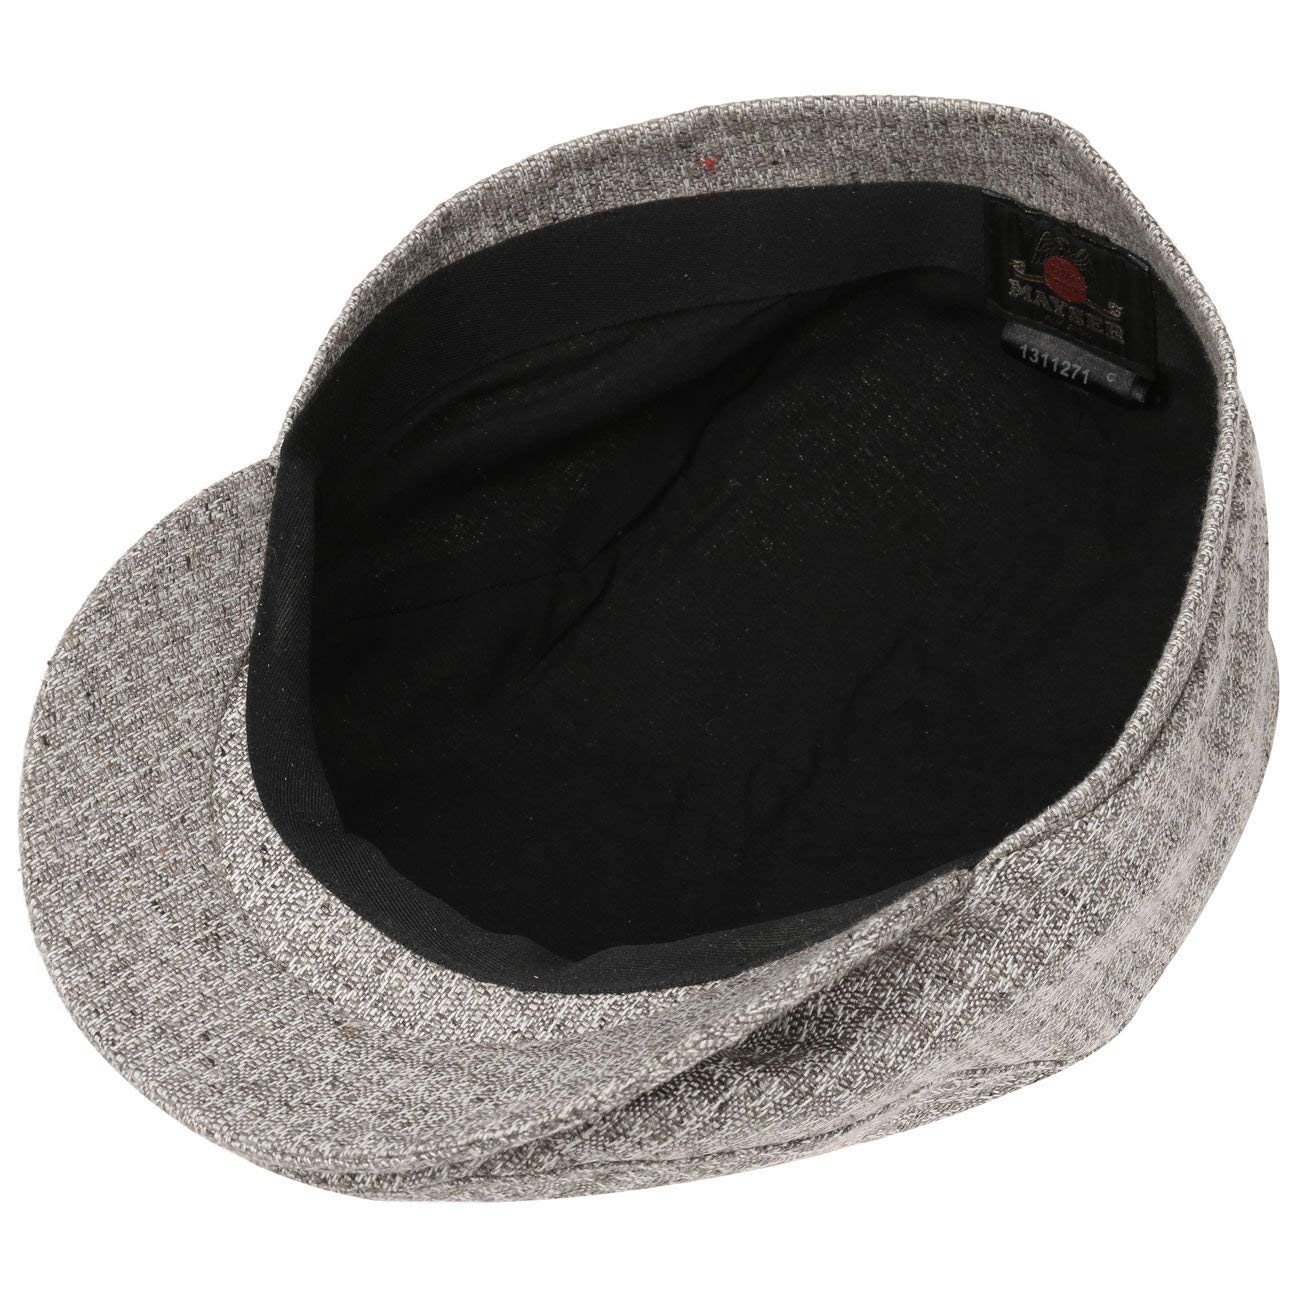 Made in The EU Mayser Seven Exclusive Silk Flat Cap Men